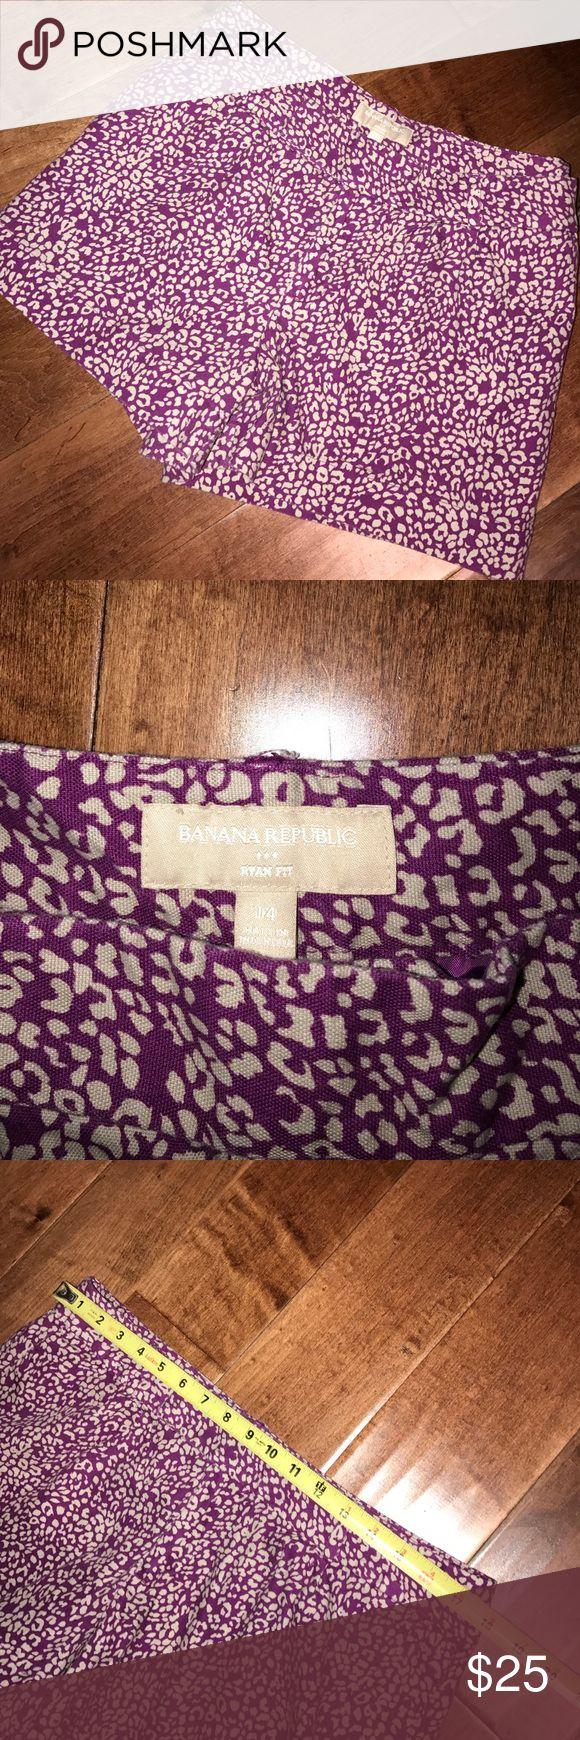 Banana Repub 🐆💜Plum Cheetah Shorts Banana Republic plum color cheetah print shorts, 97% cotton 3% spandex, have some stretch to them. Adorable!!! Great spring and summer color Banana Republic Shorts Cargos